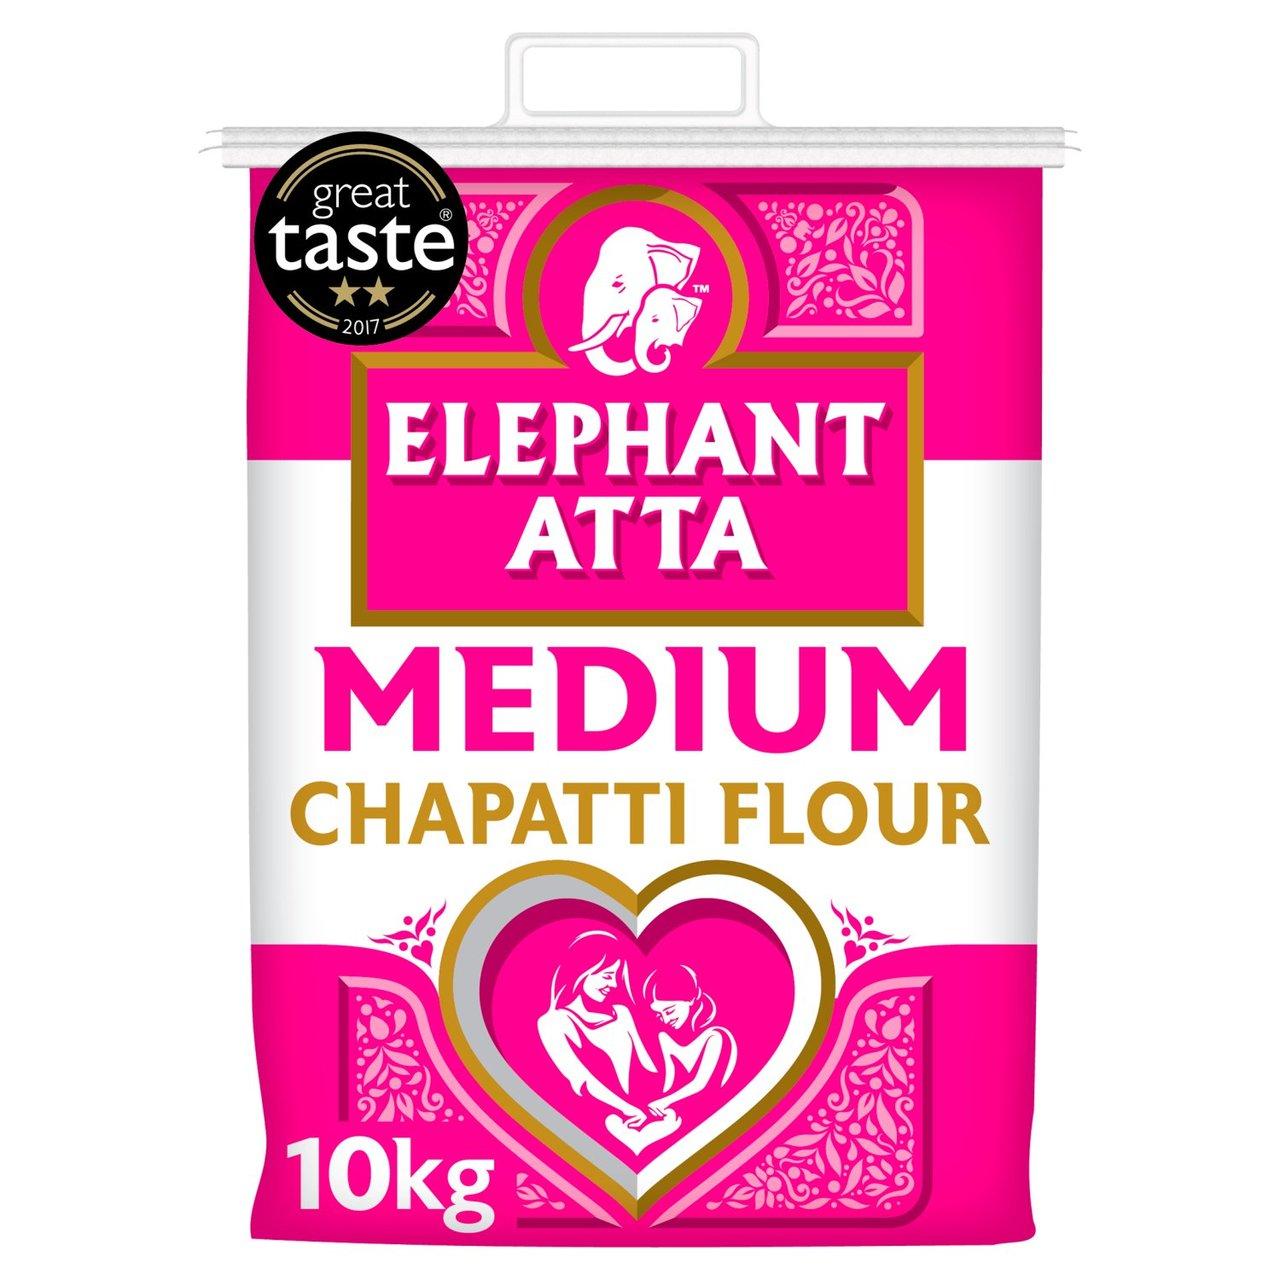 Elephant Atta Medium Chapatti Flour 10Kg £5 @ Morrisons